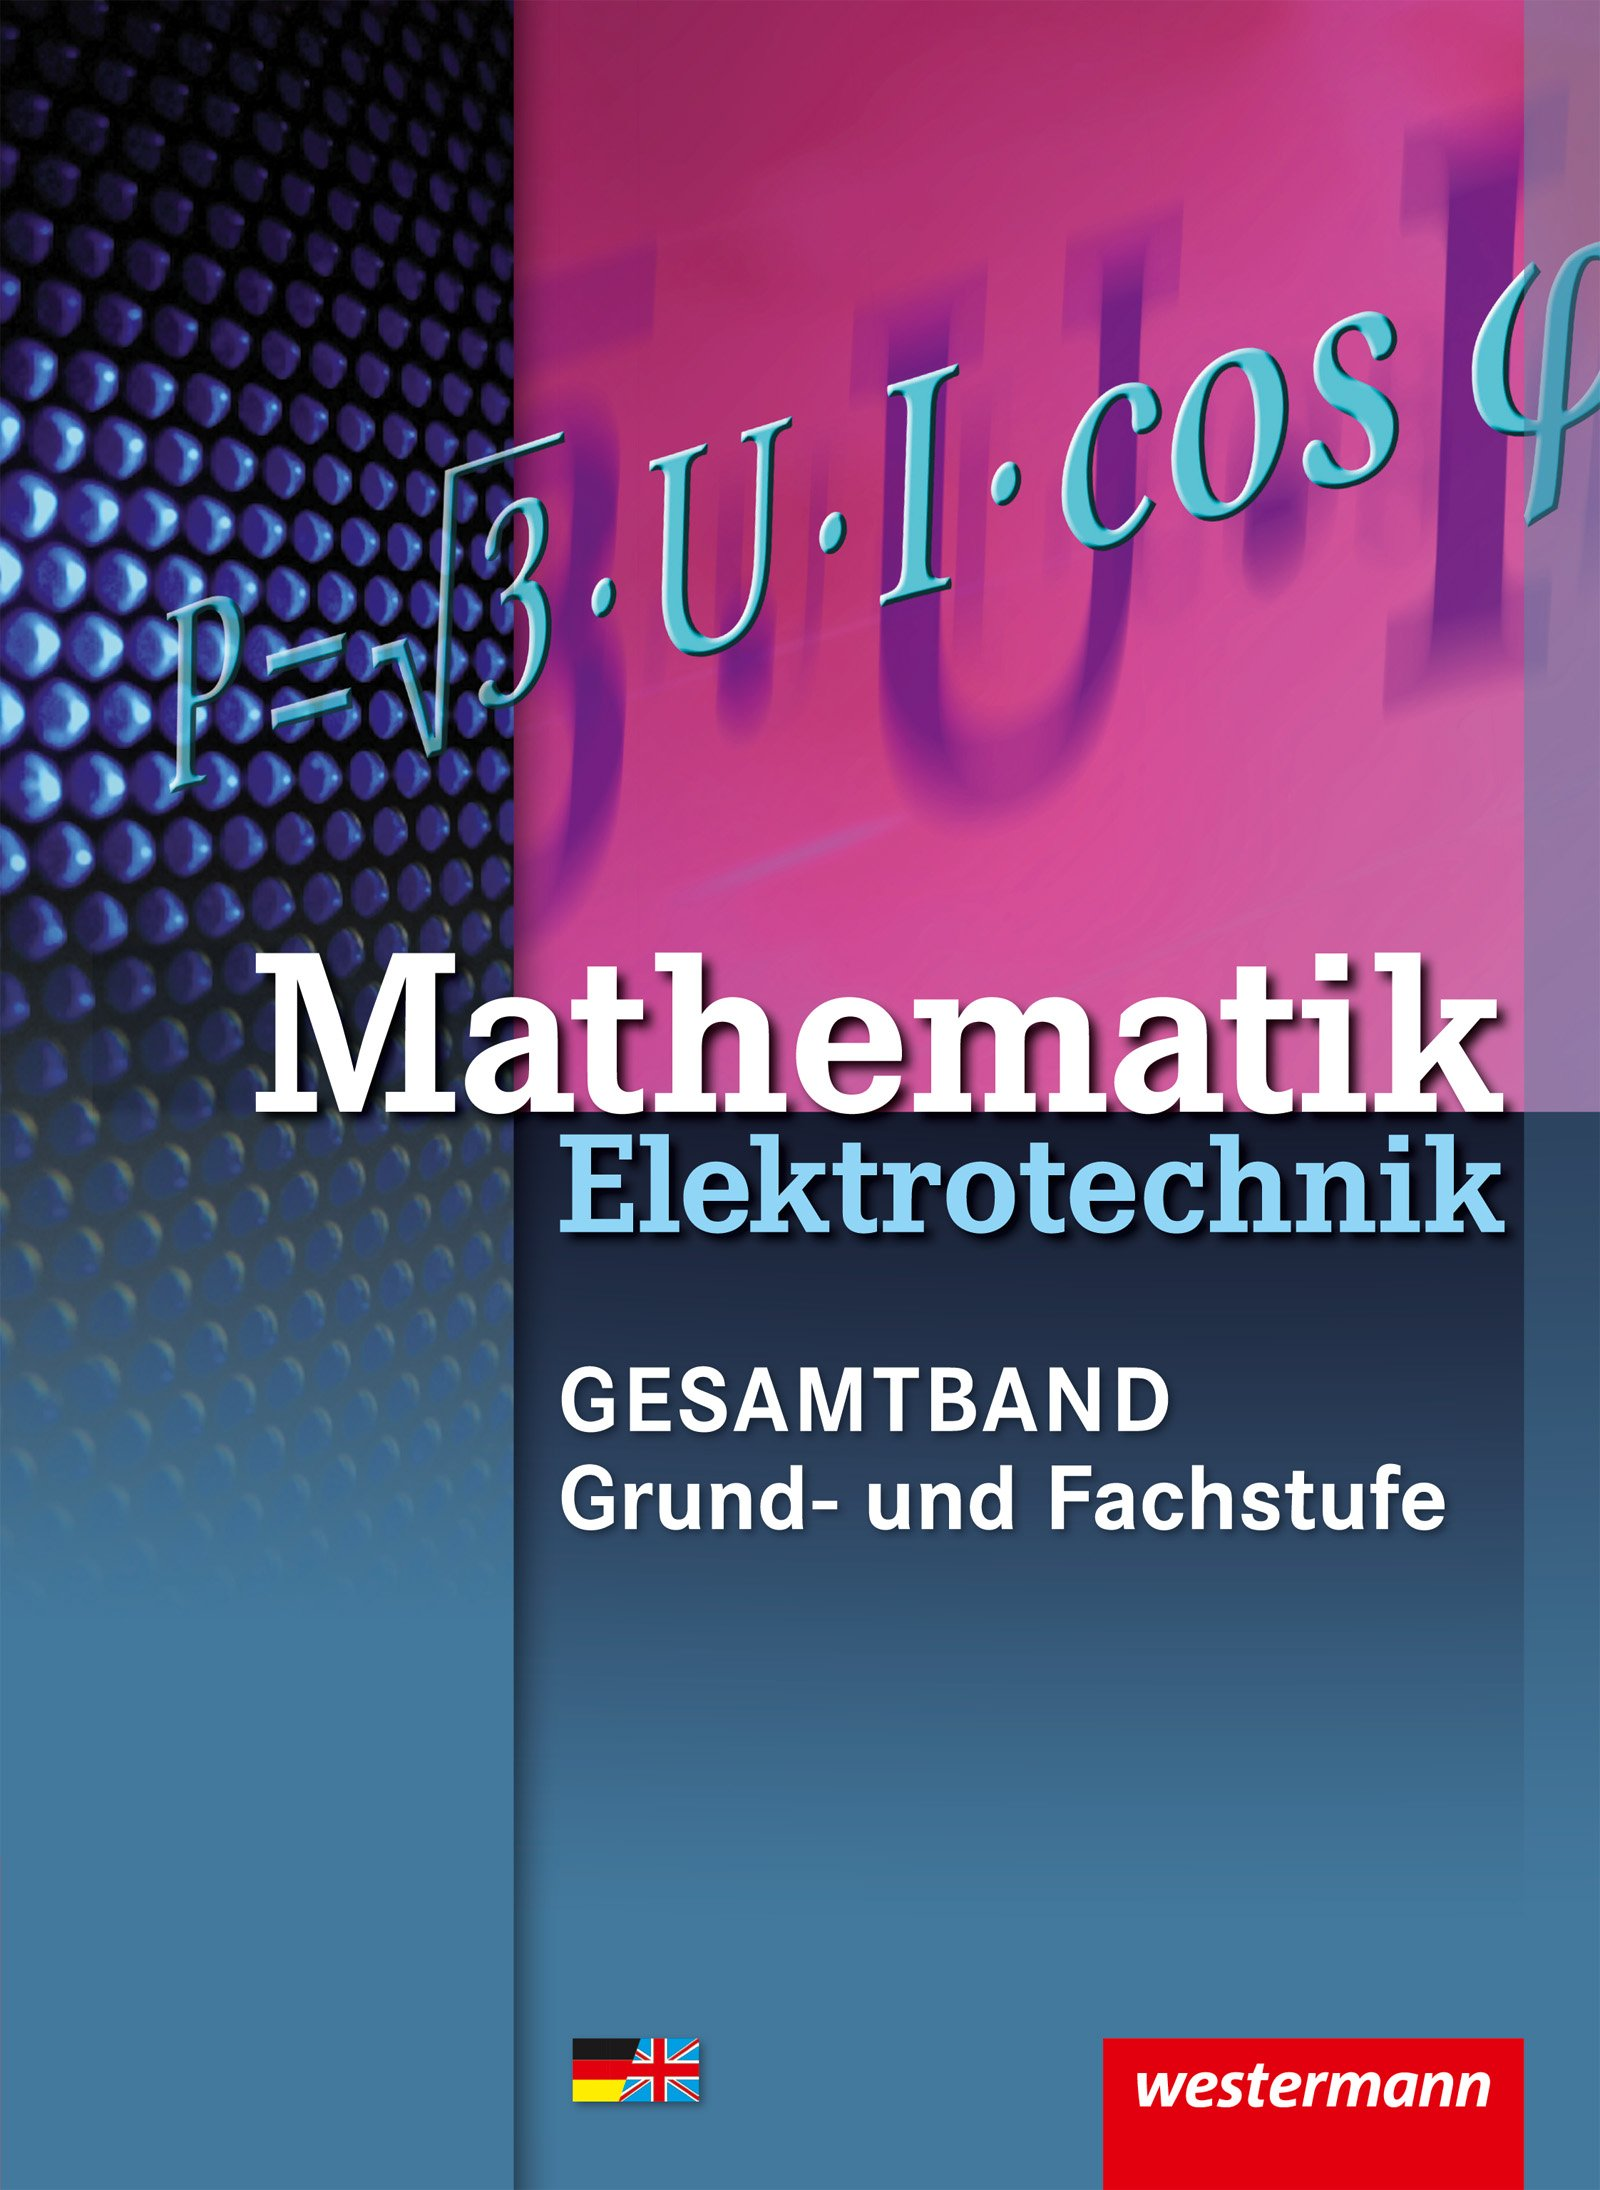 Elektrotechnik Technische Mathematik - Gesamtband: Mathematik Elektrotechnik: Grund- und Fachwissen: Schülerband